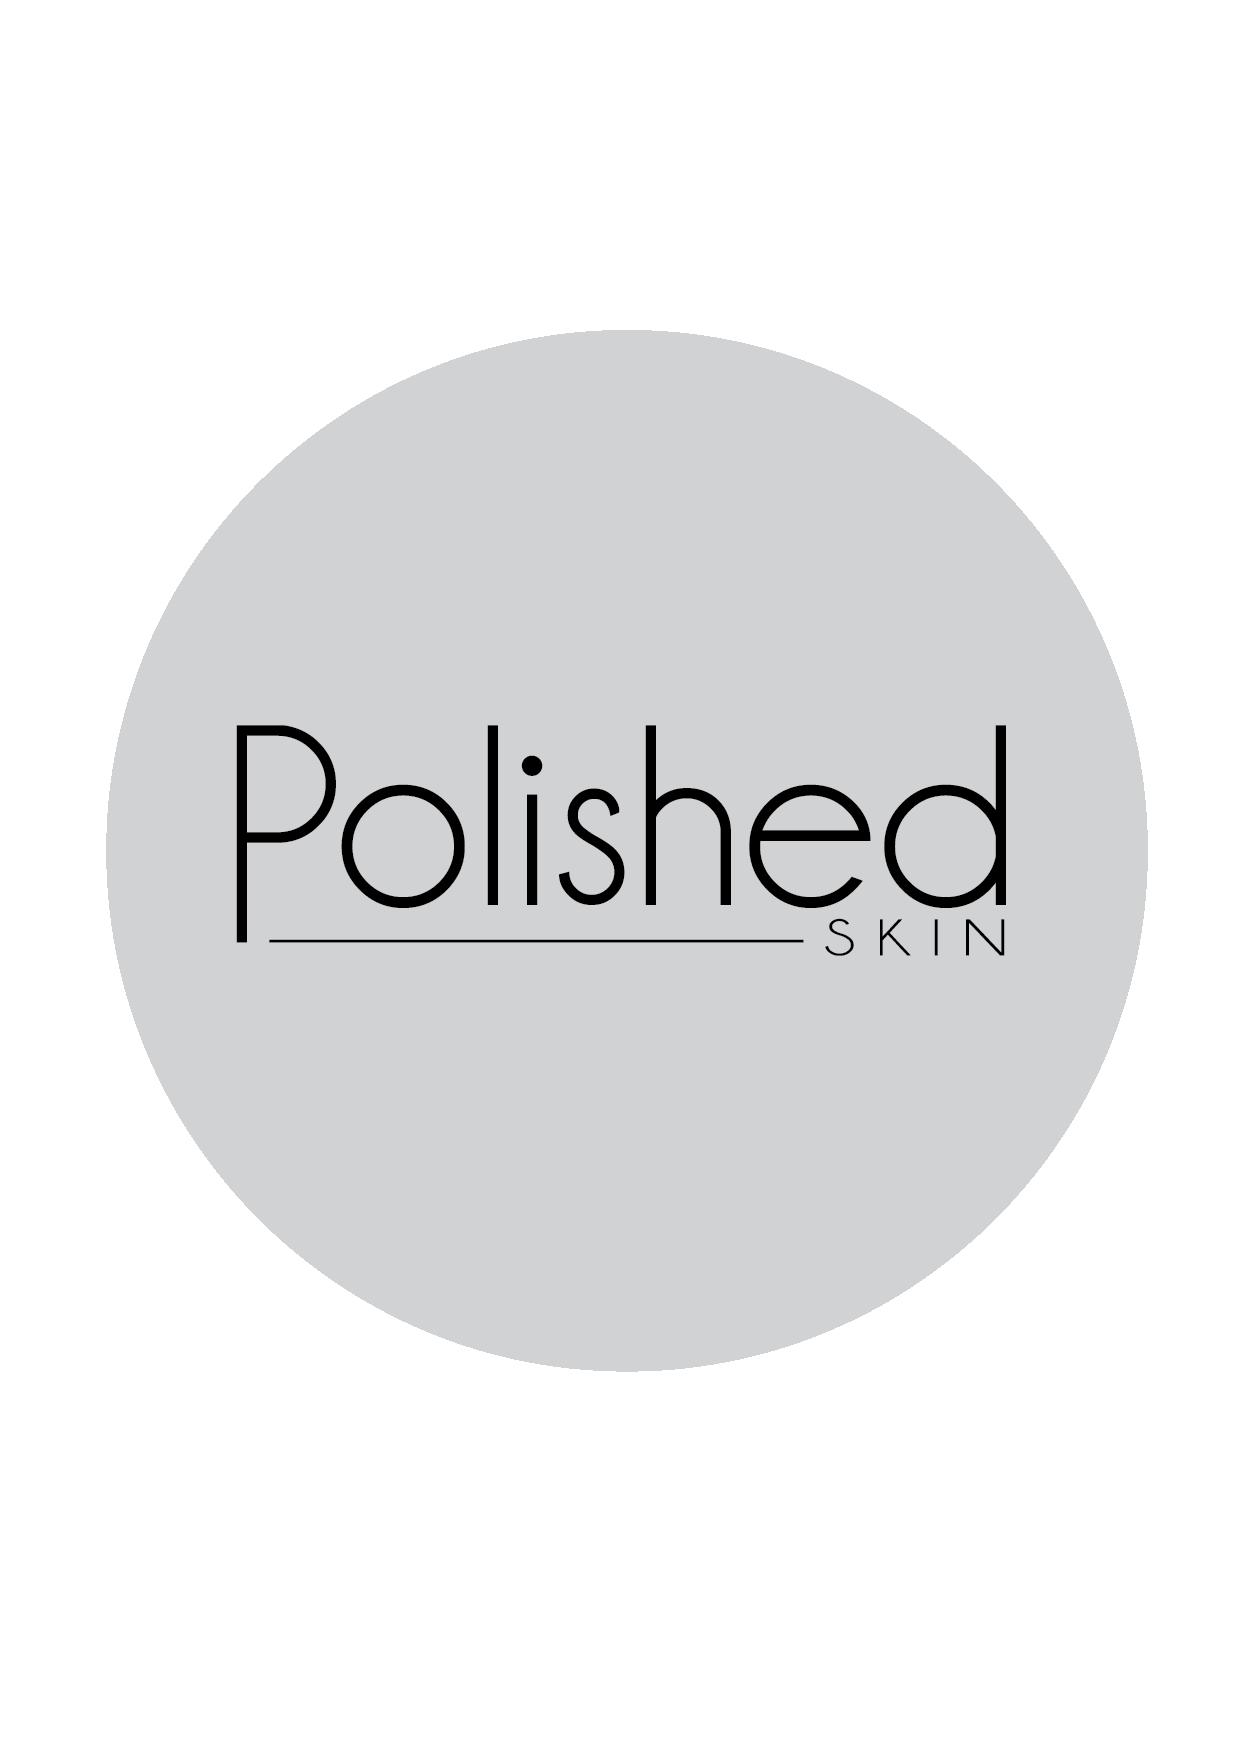 Polished Skin